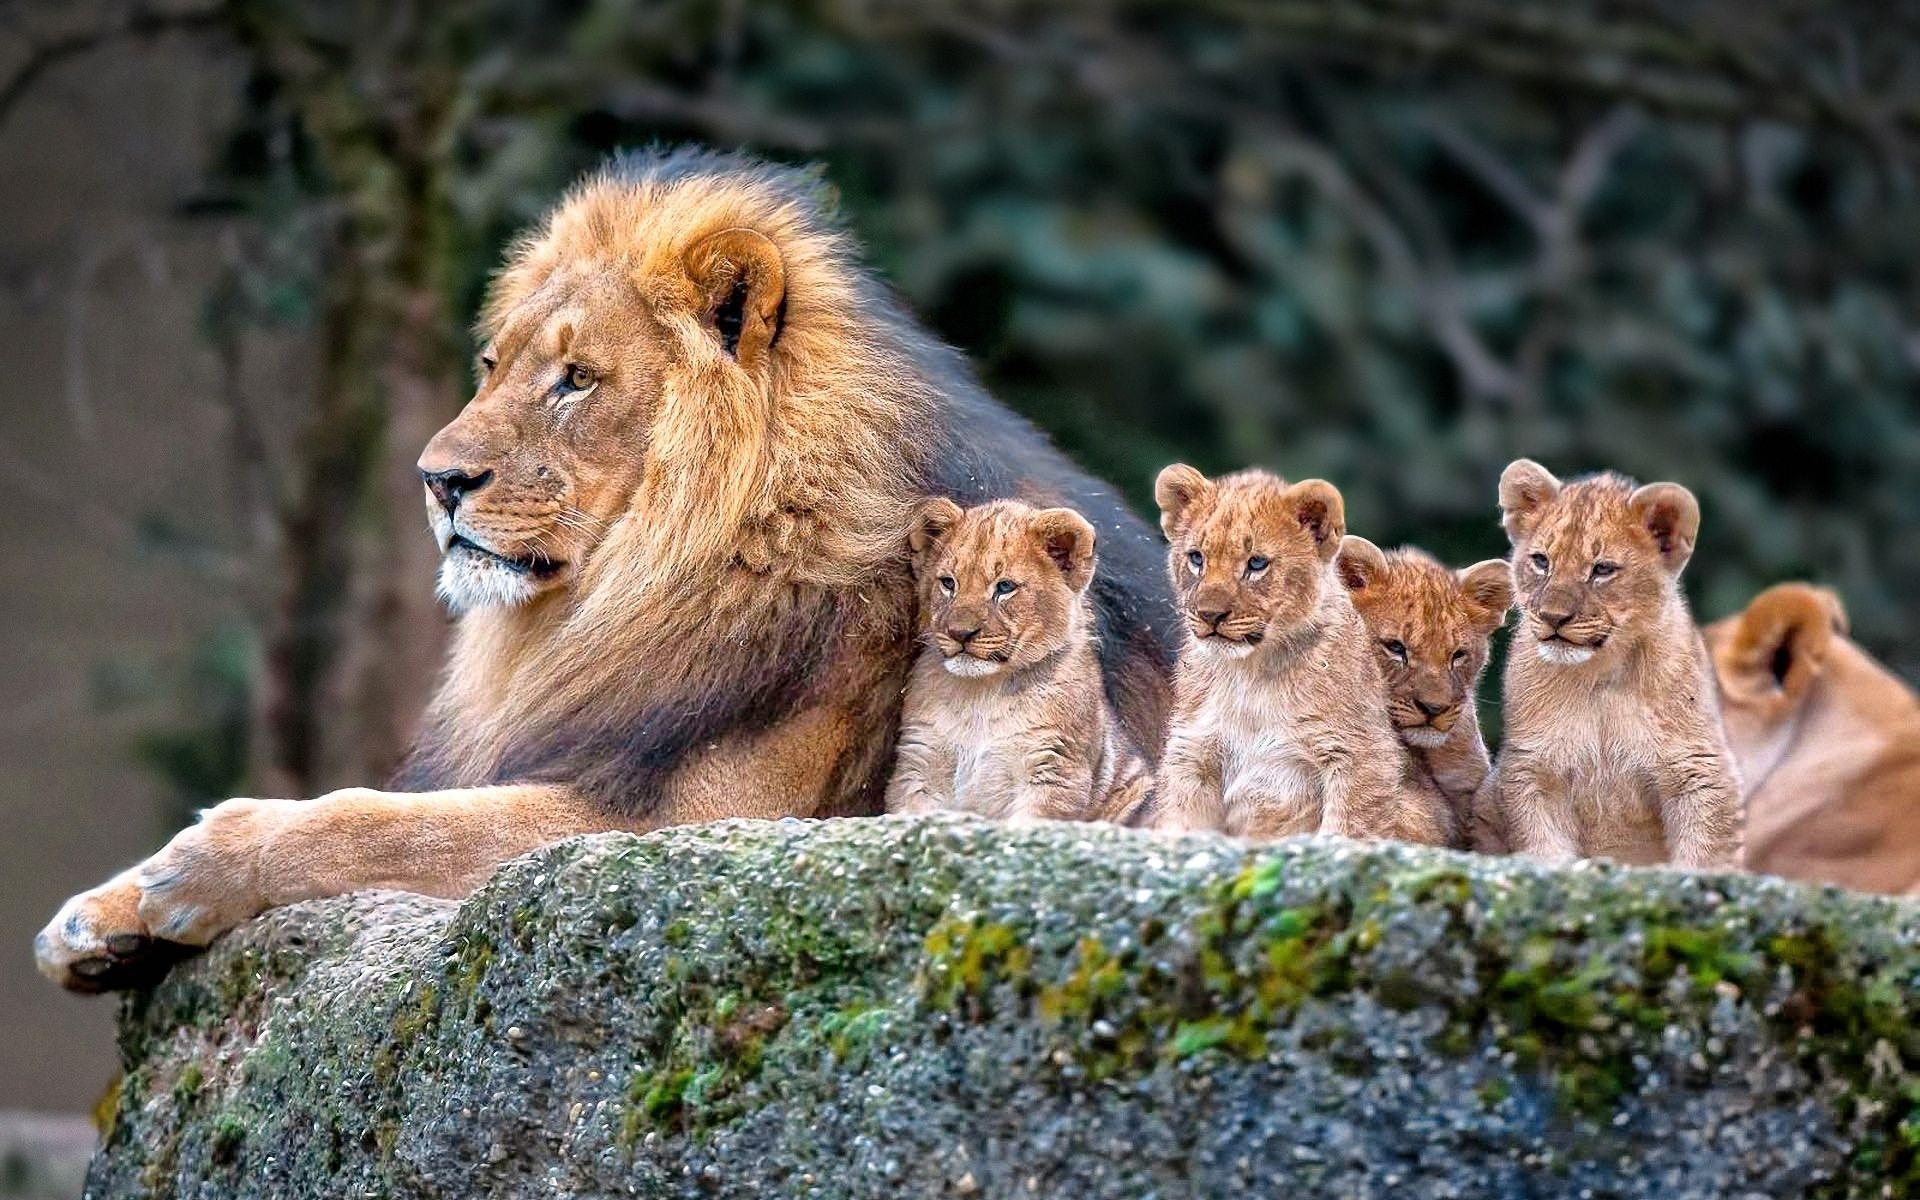 animal lion cub predator (animal) baby animal big cat wallpaper